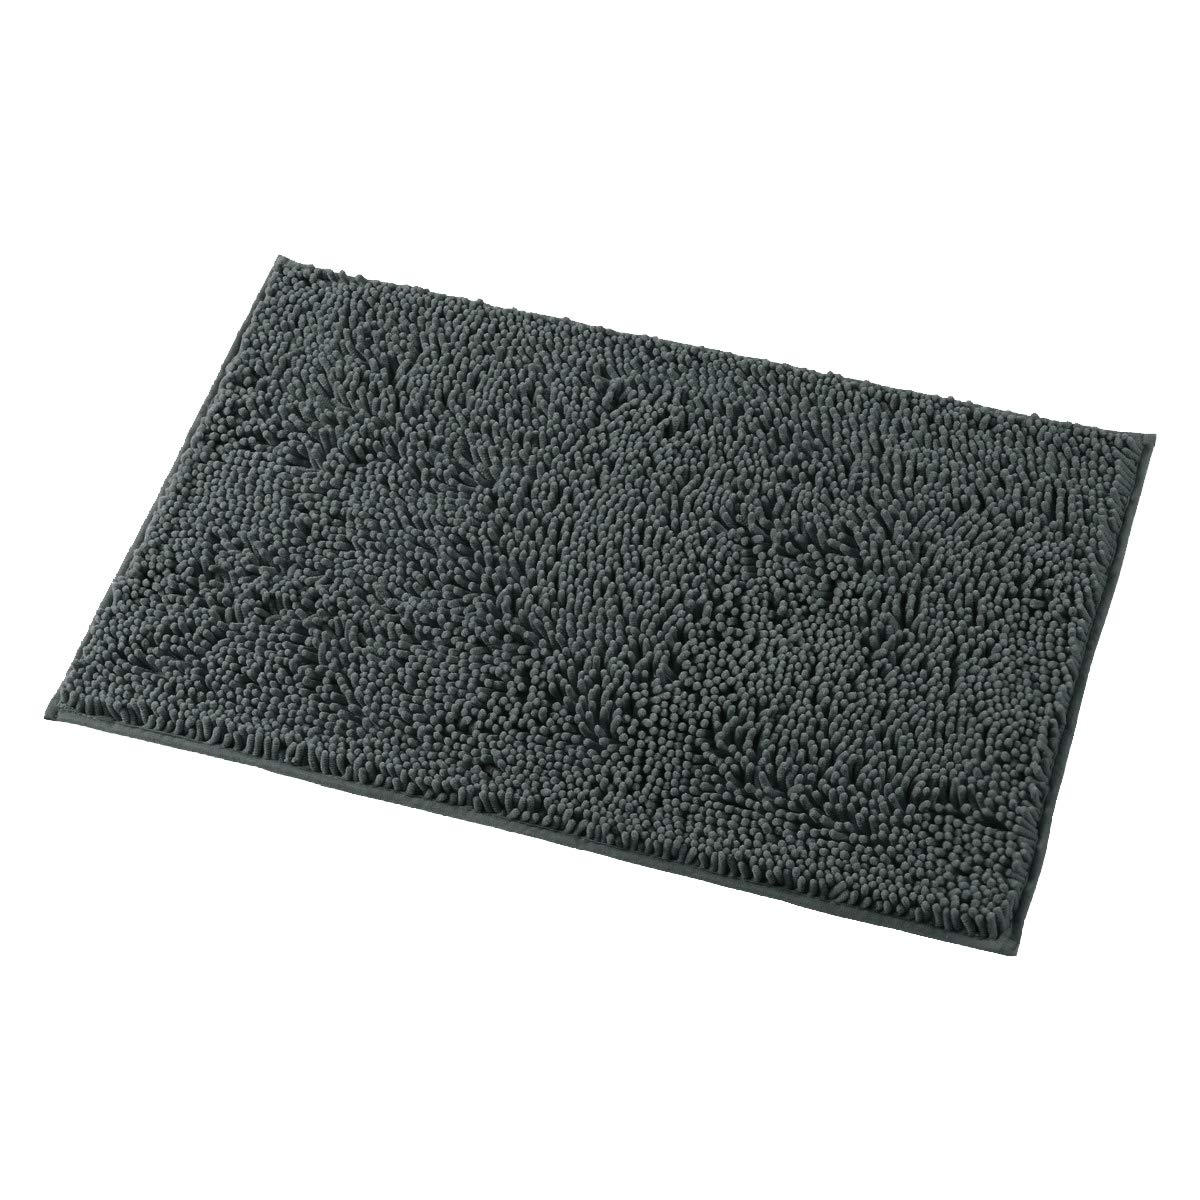 MAYSHINE 20x32 Inches Non-Slip Bathroom Rug Shag Shower Mat Machine-Washable Bath Mats with Water Absorbent Soft Microfibers of - Dark Gray